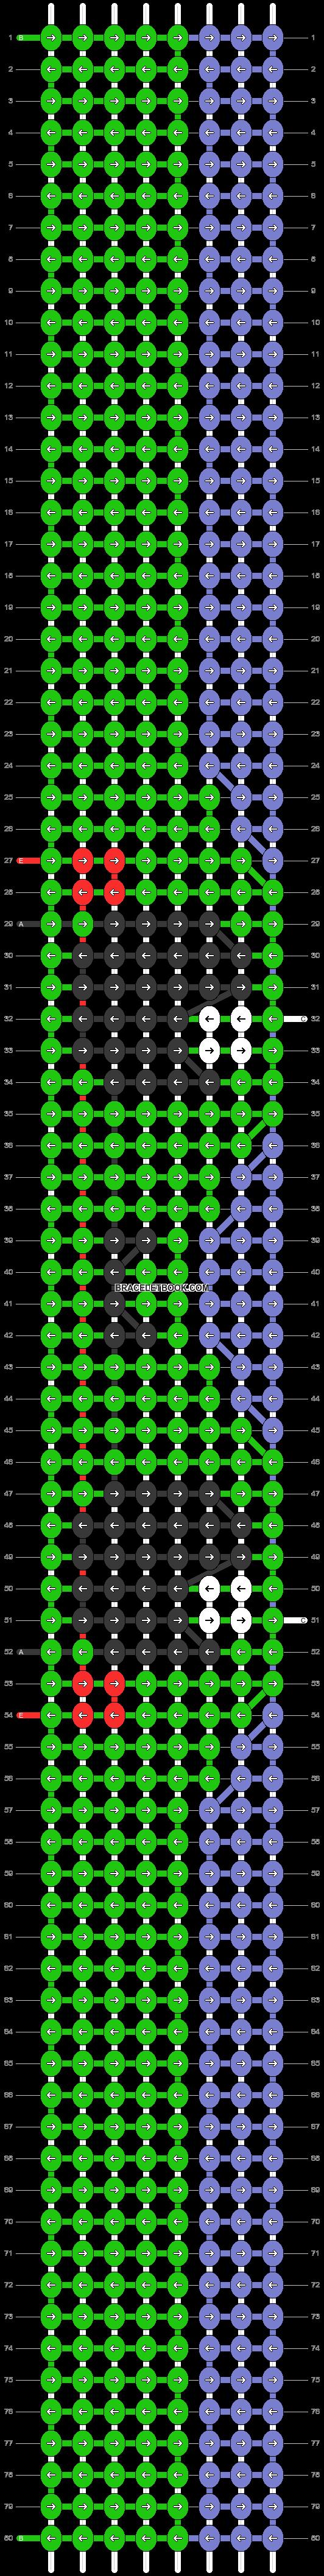 Alpha pattern #97610 pattern